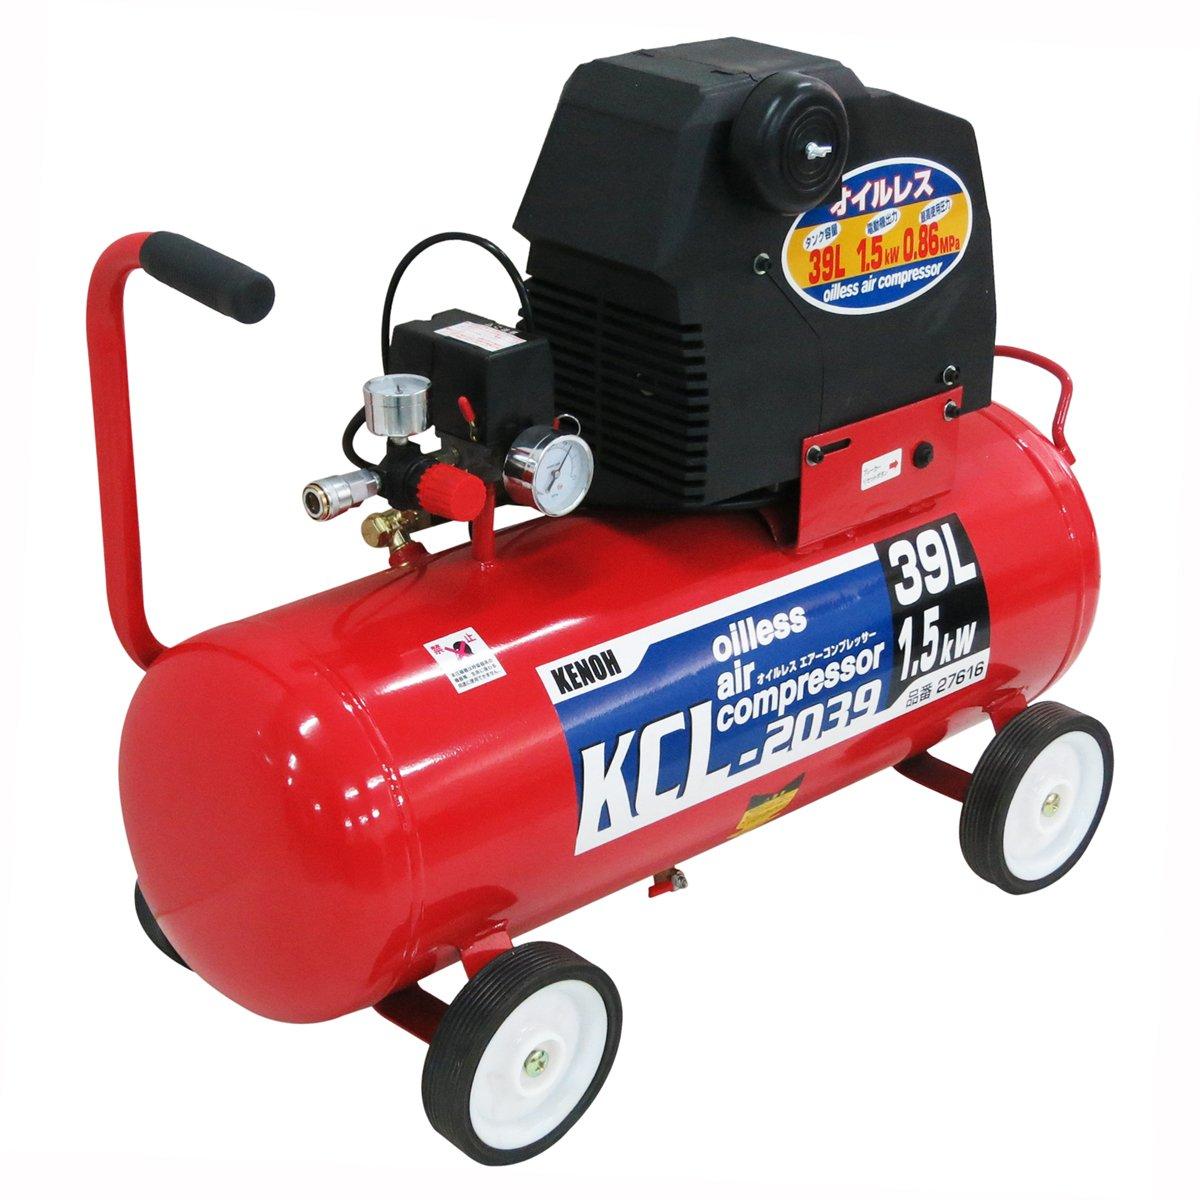 KNO オイルレスコンプレッサー KCL-2039 B013HYDTD0